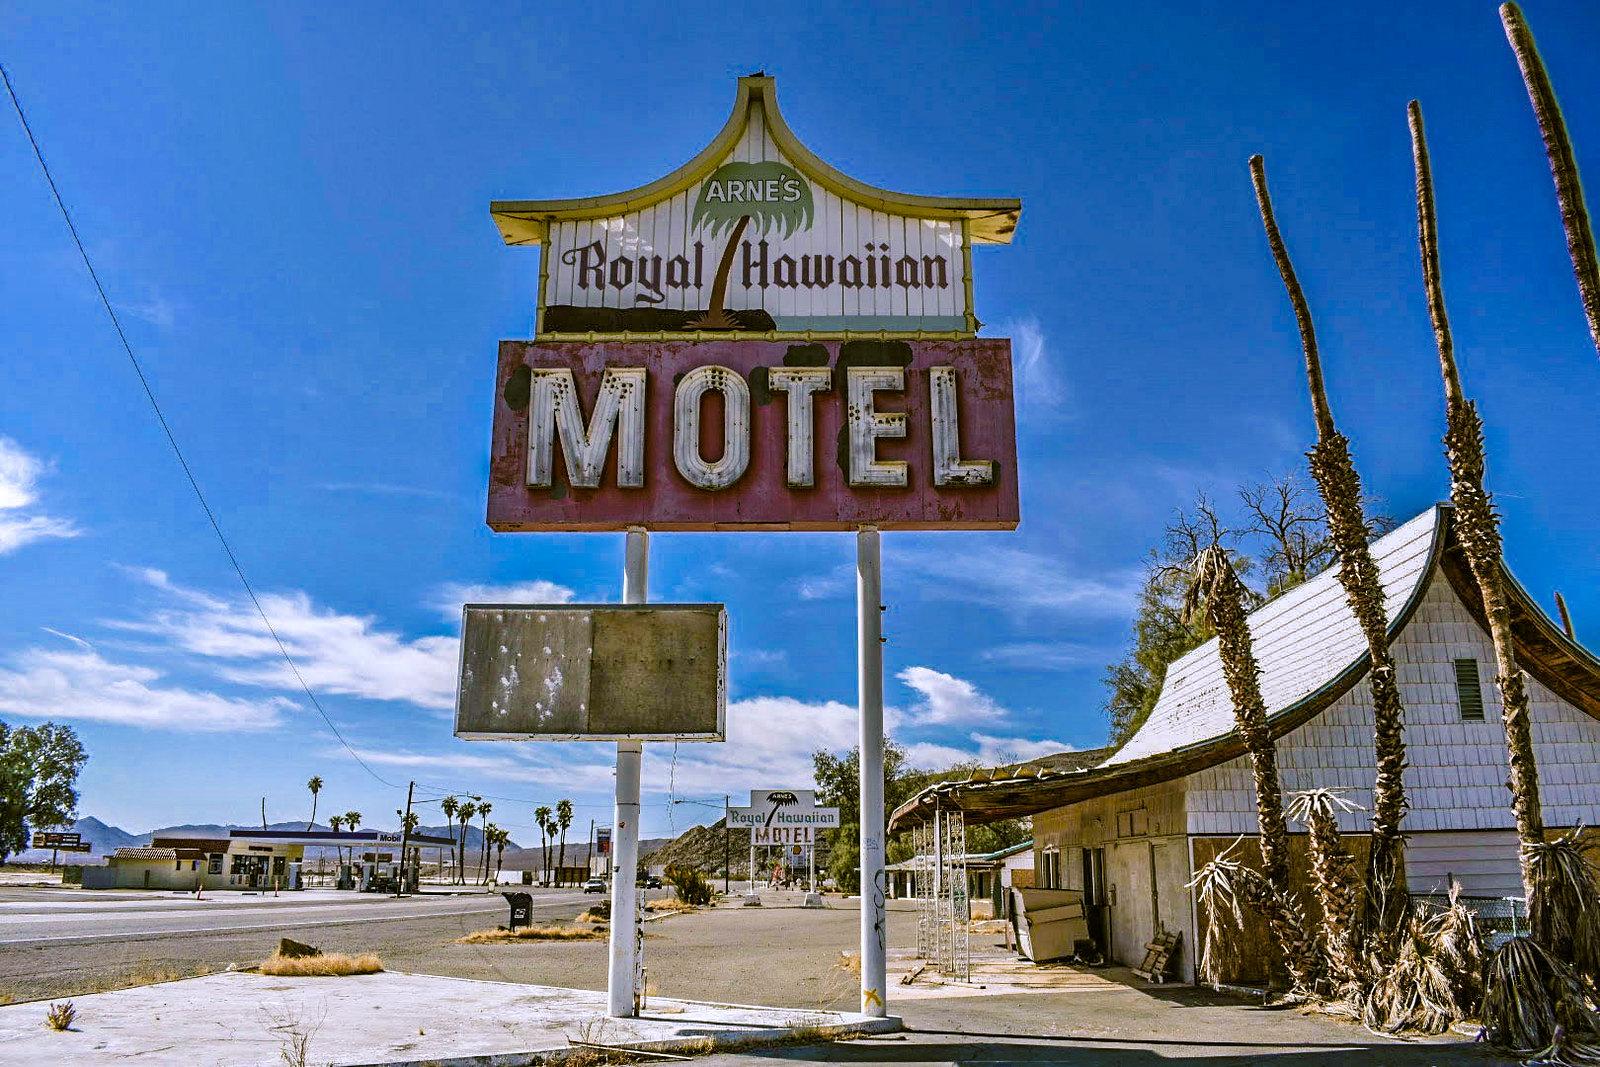 Arne's Royal Hawaiian Motel - Baker, California U.S.A. - November 17, 2019